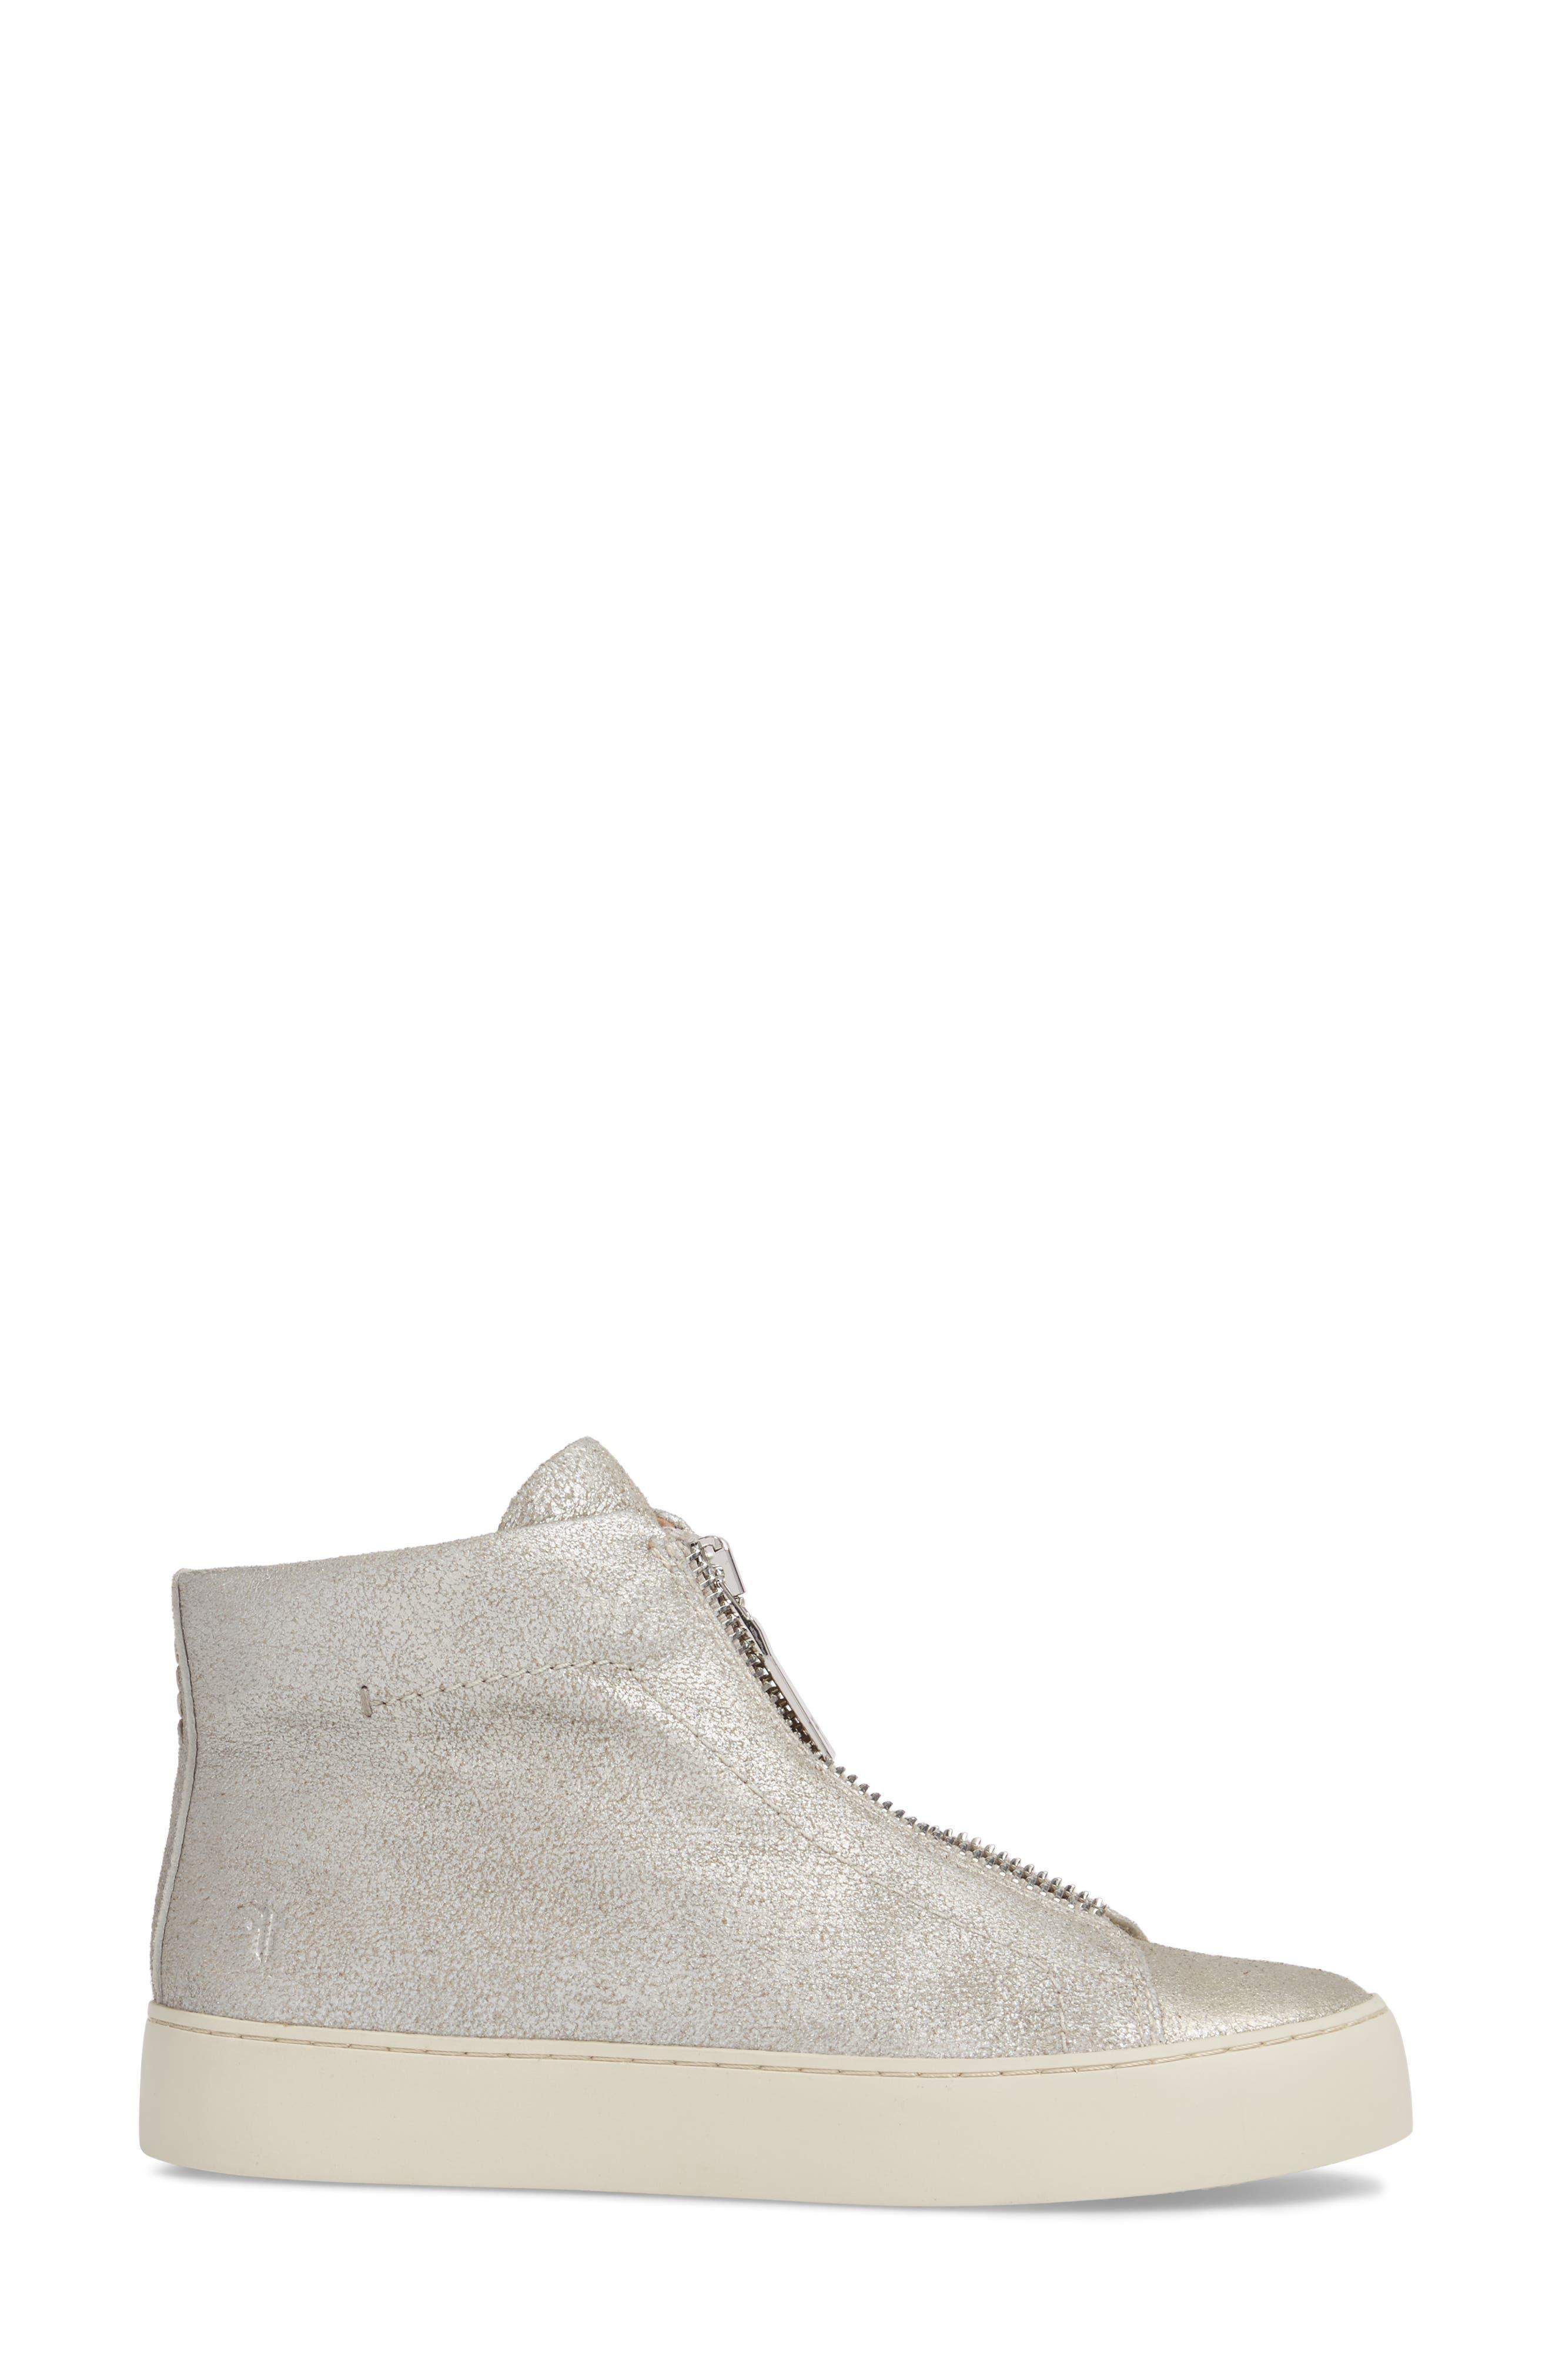 Lena Zip High Top Sneaker,                             Alternate thumbnail 3, color,                             Silver